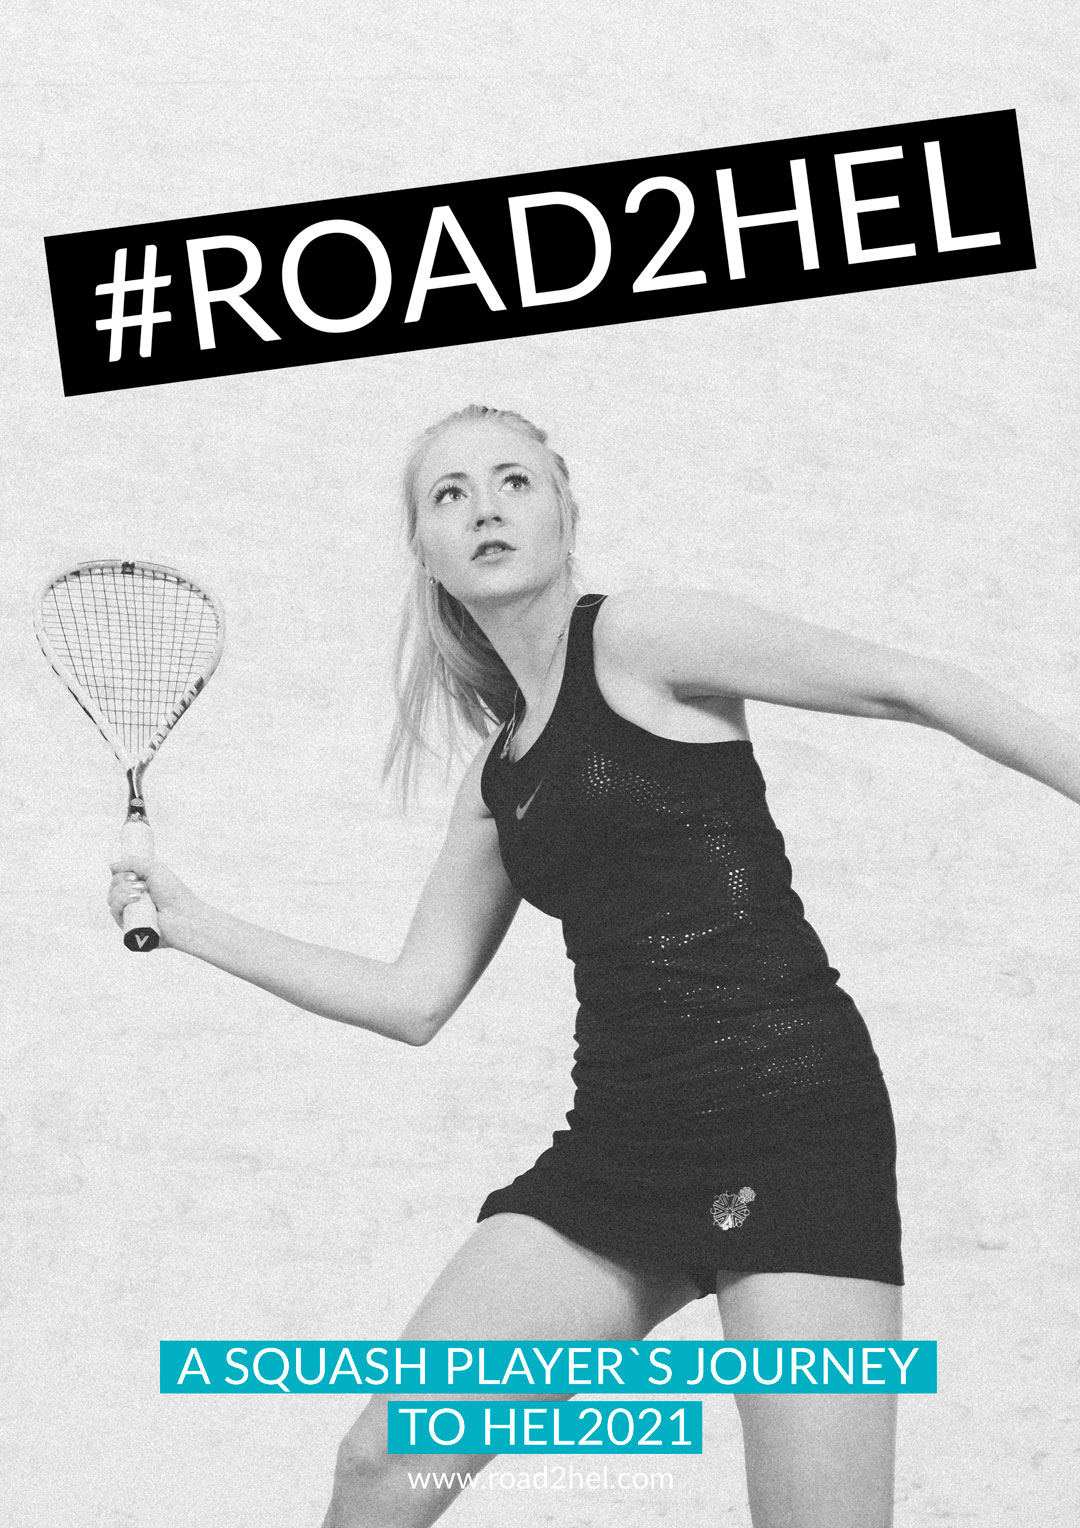 Emilia_Korhonen_Squash_Player_Finland_road2hel